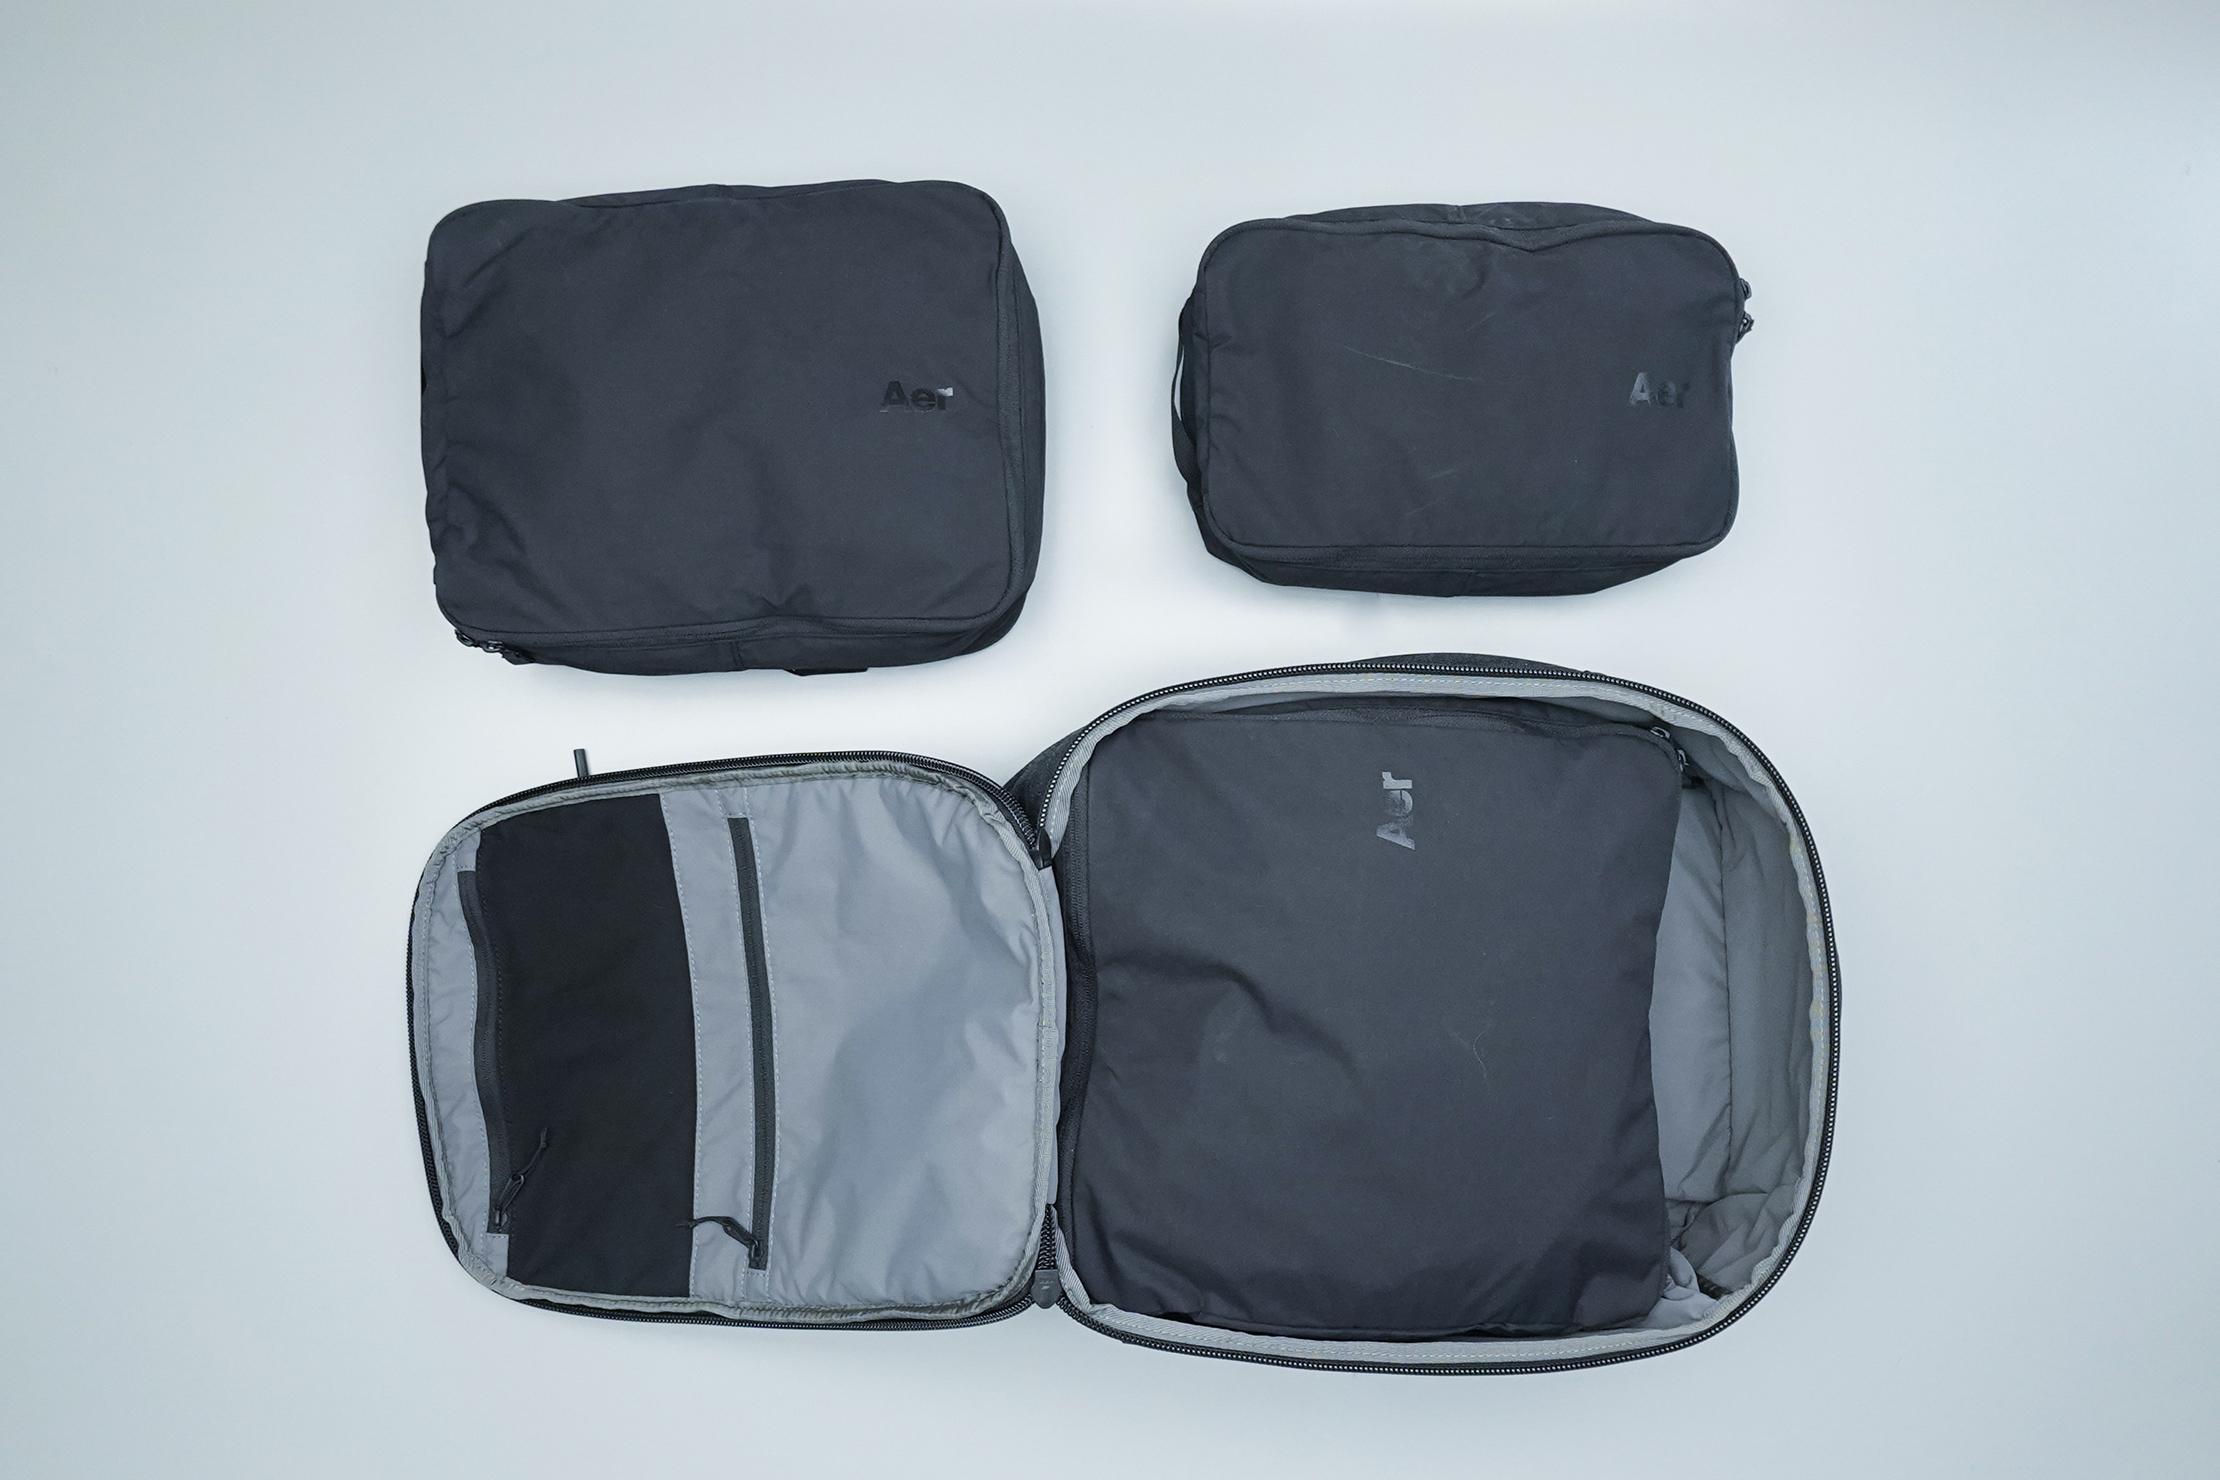 Aer Packing Cubes (V2) Very Big